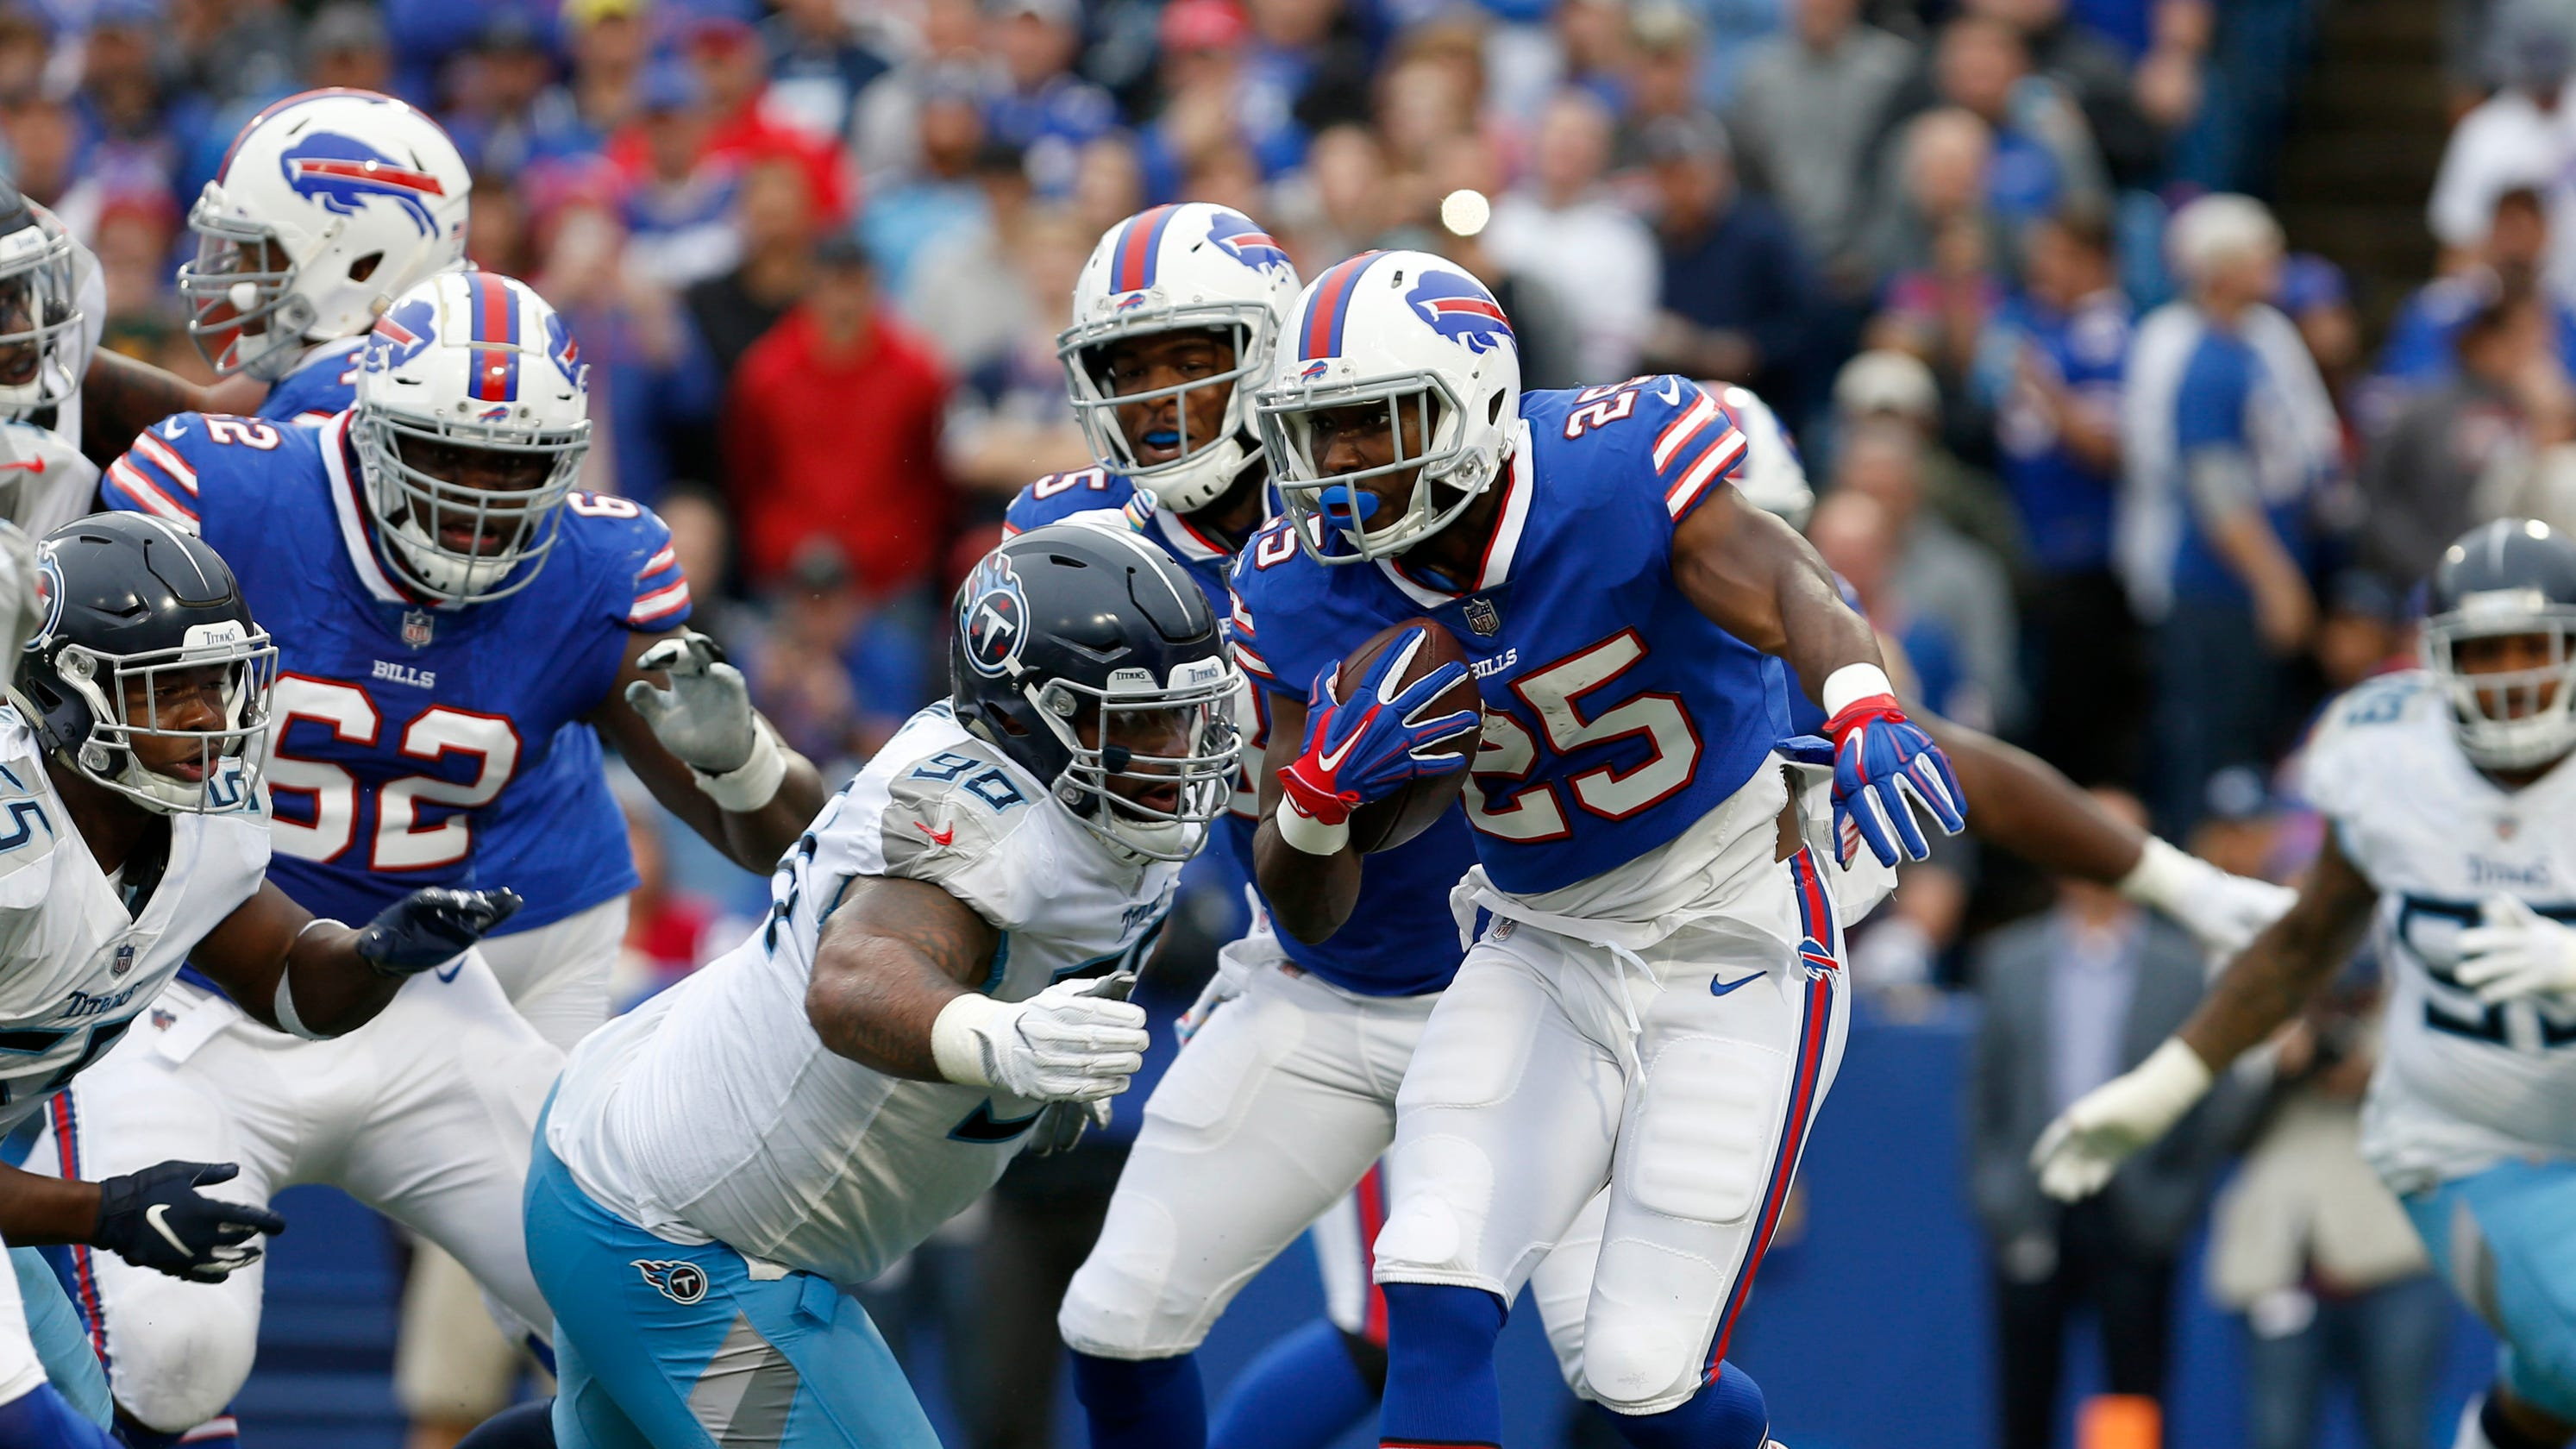 Buffalo Bills Defeat Tennessee Titans On Last Second Field Goal